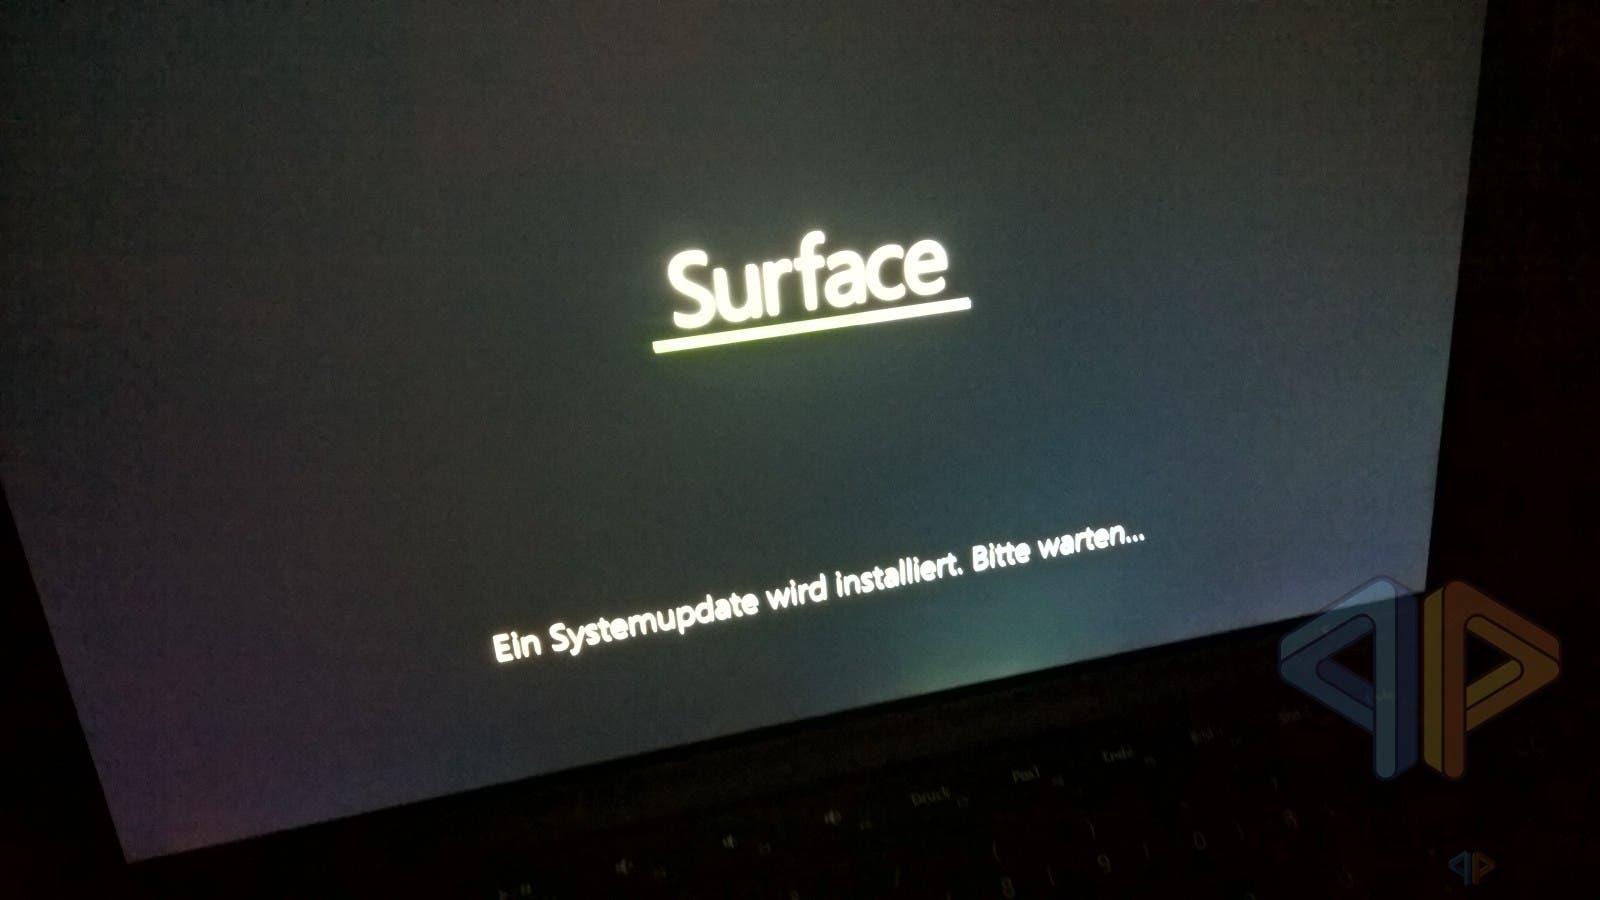 WP_20151114_15_54_13_Pro_LI Review: Microsoft Surface Pro 4 im Test